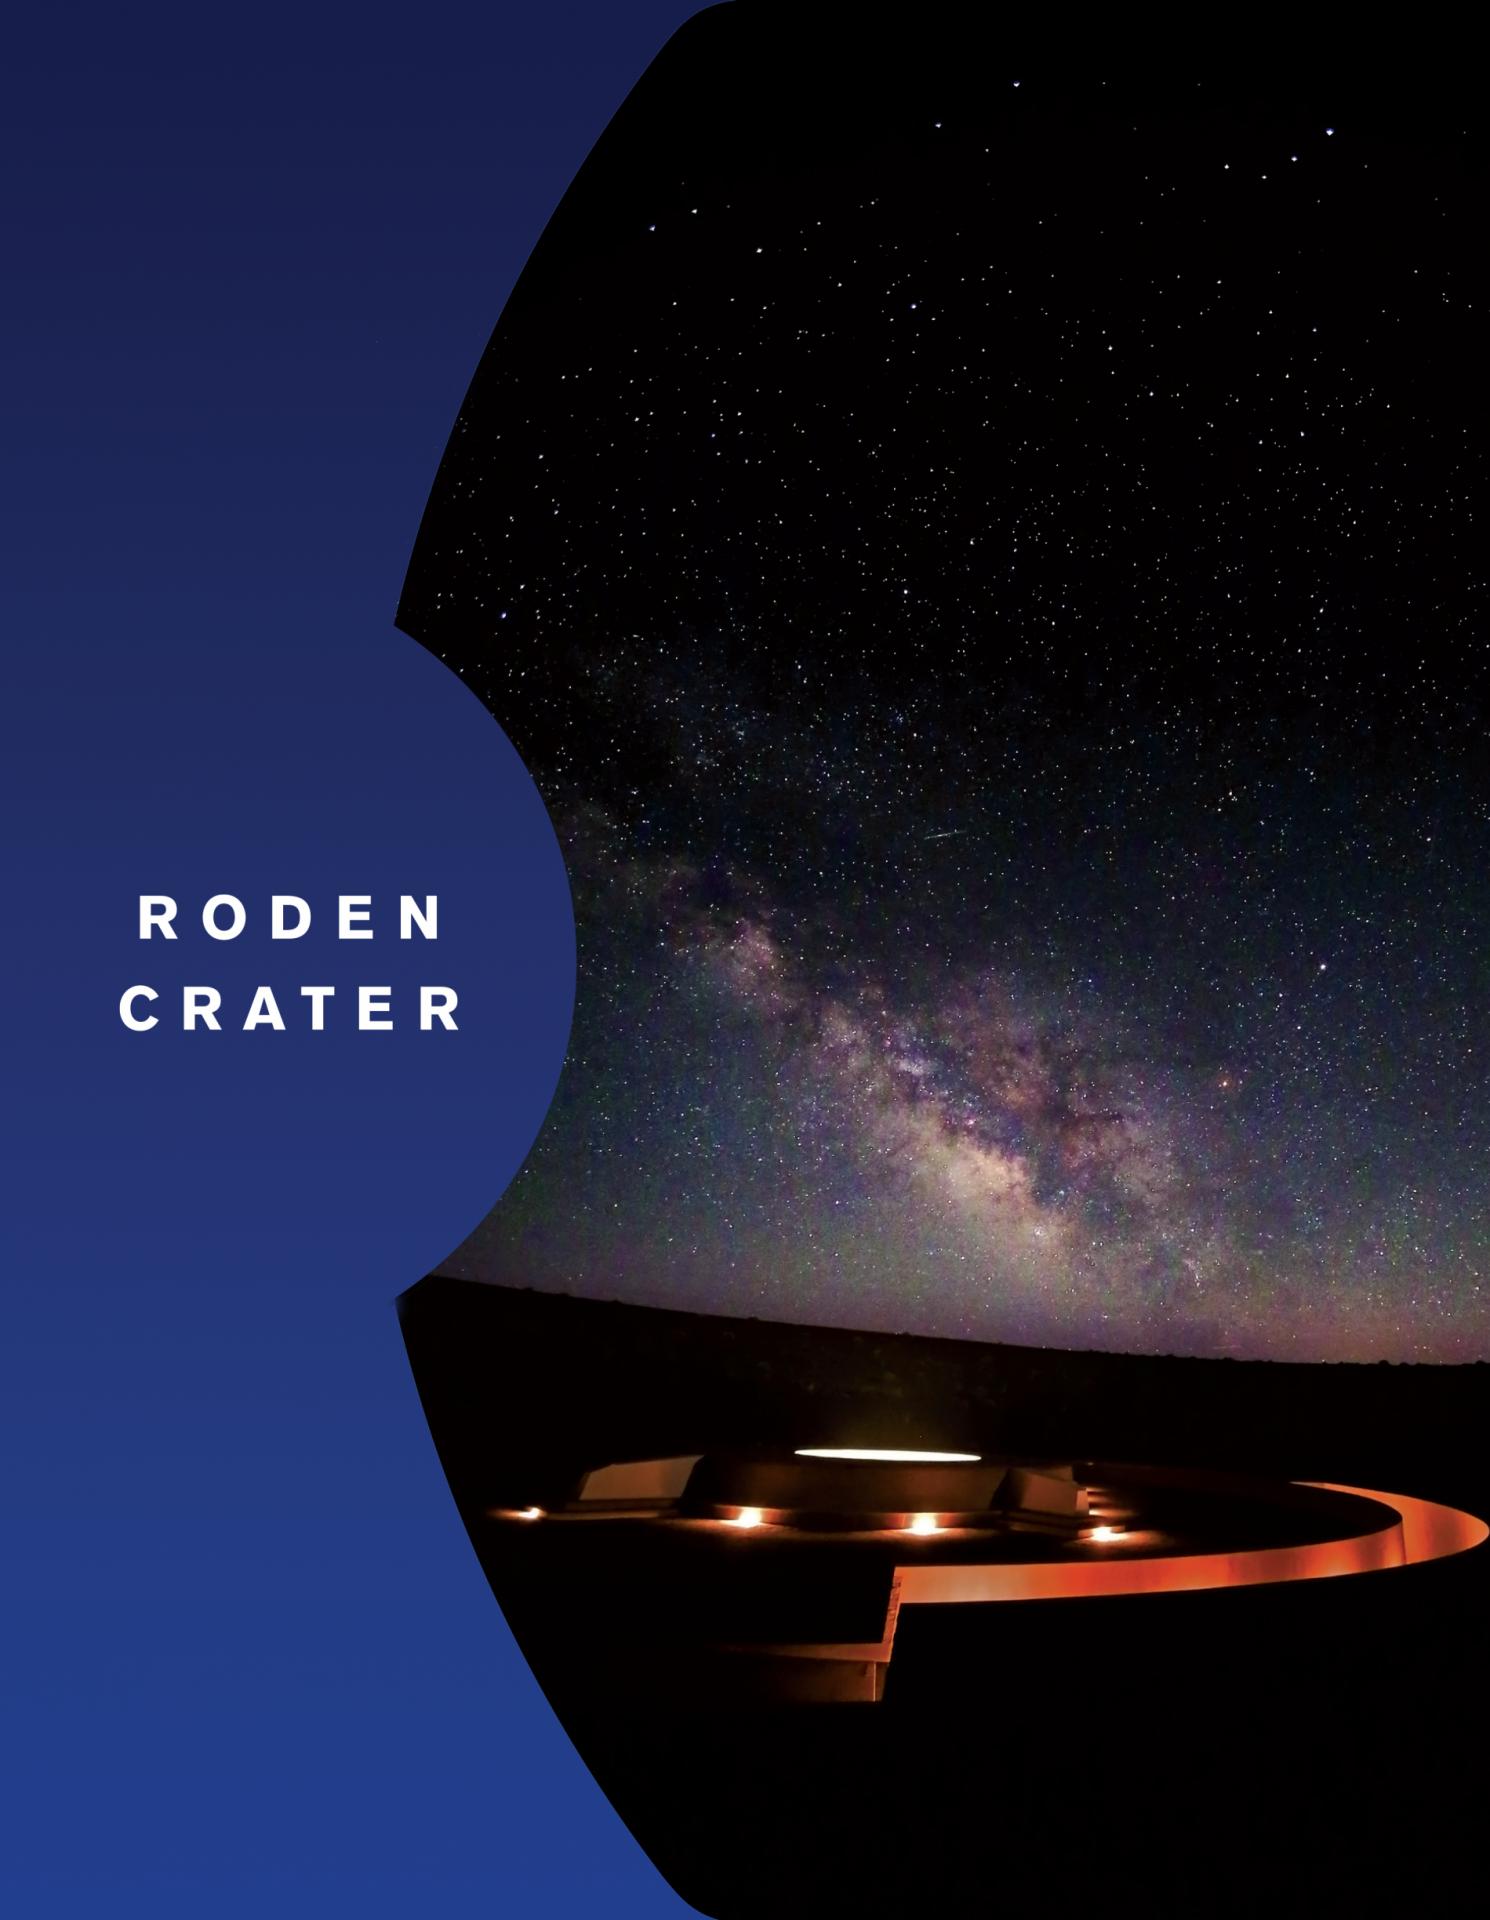 ASU Roden Crater